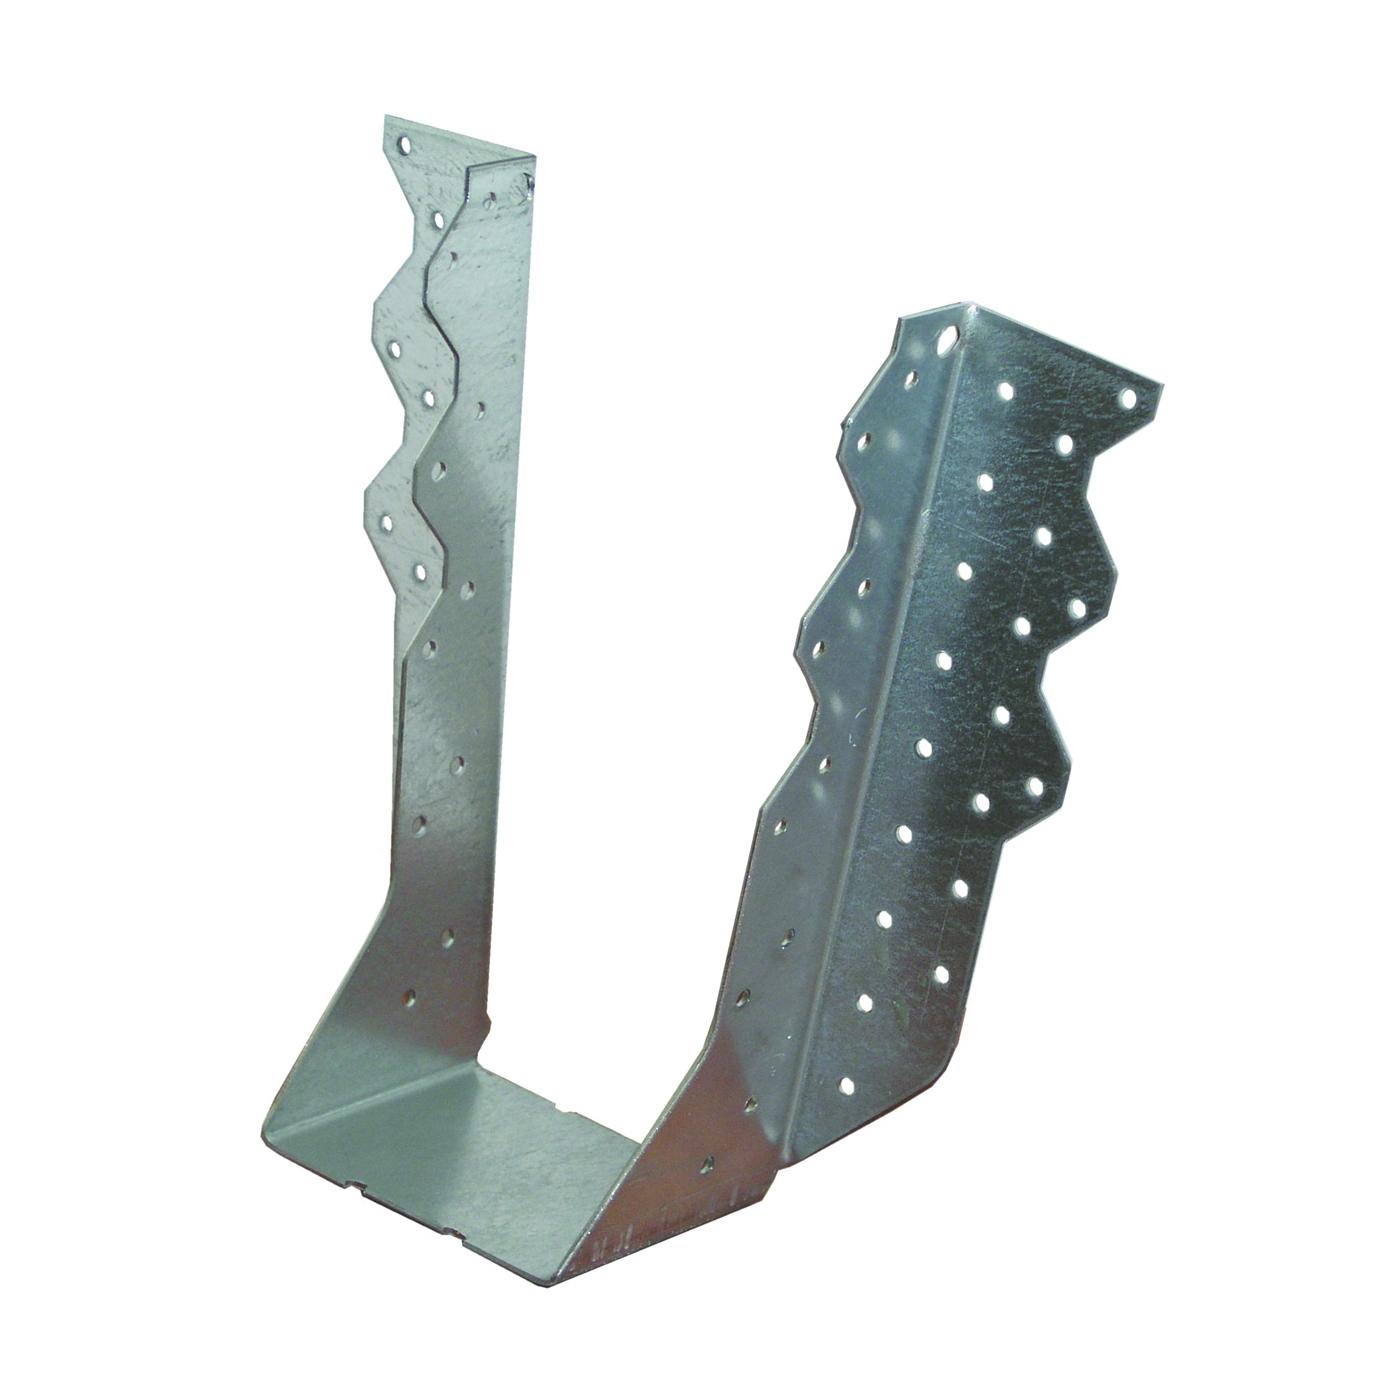 Picture of MiTek THD410 Truss Hanger, 9-1/16 in H, 3 in D, 3-5/8 in W, 3-1/2 in x 9-1/4 to 14 in, Steel, G90 Galvanized